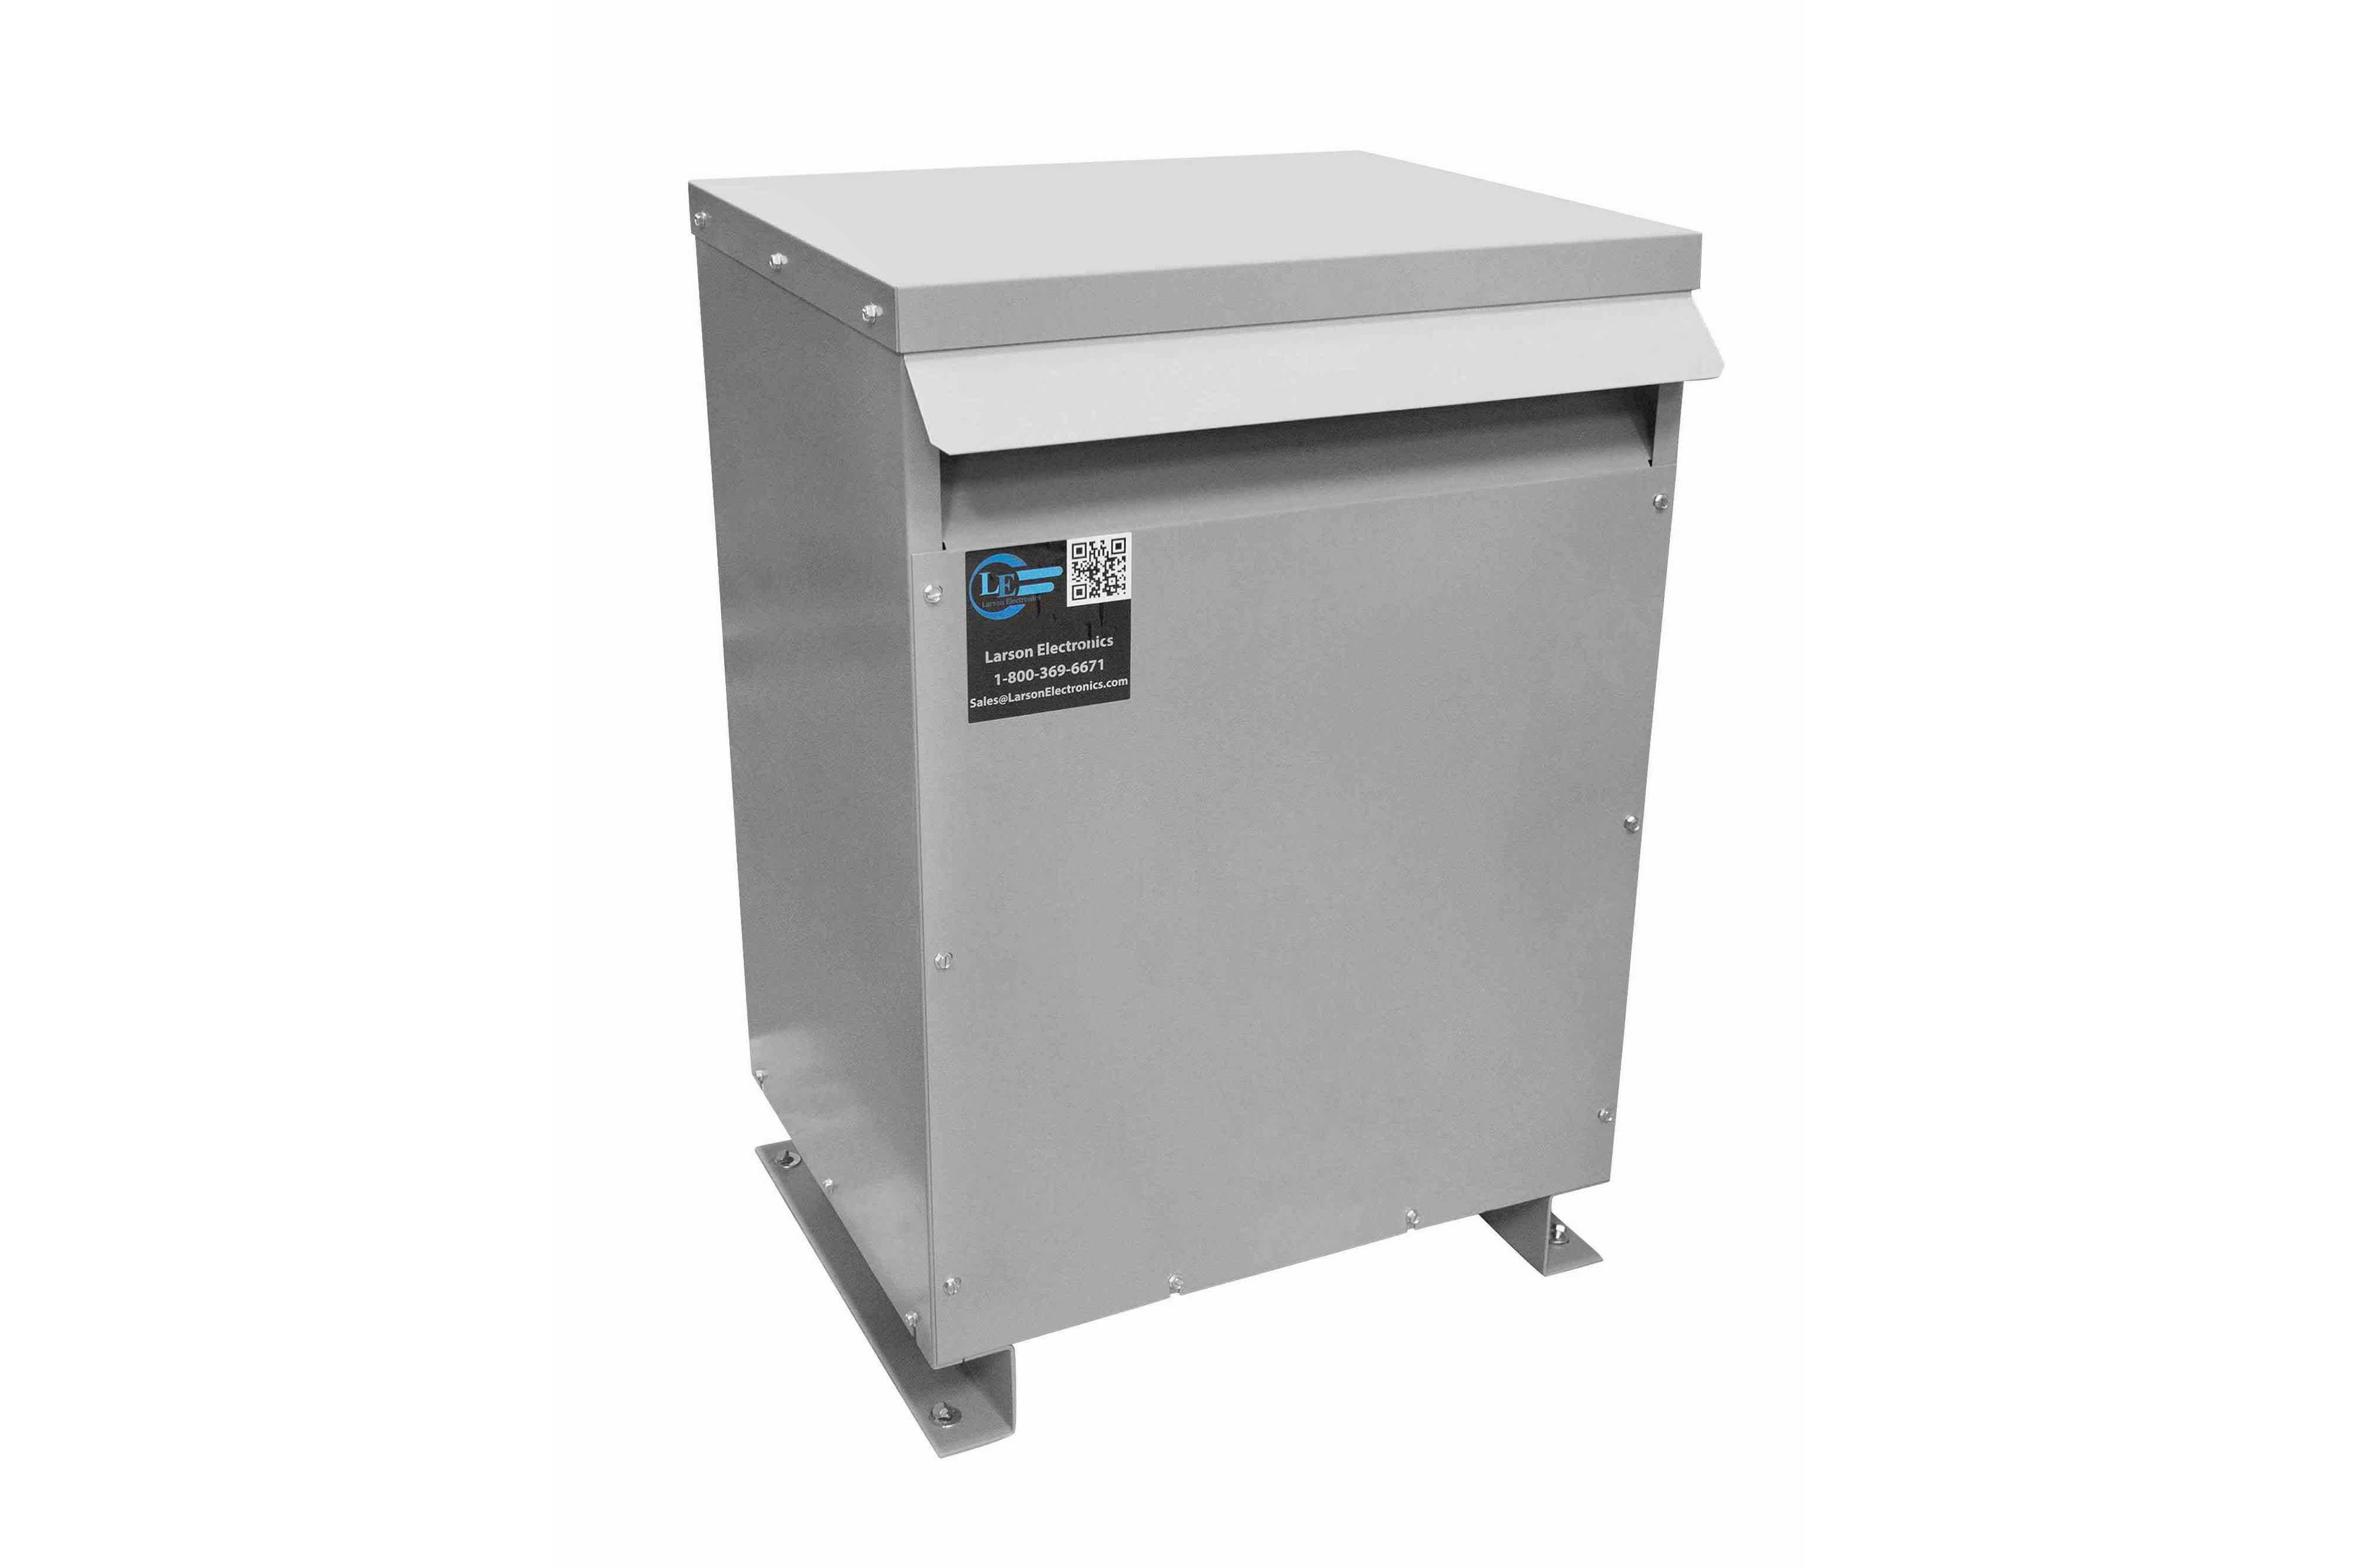 200 kVA 3PH Isolation Transformer, 240V Wye Primary, 600V Delta Secondary, N3R, Ventilated, 60 Hz